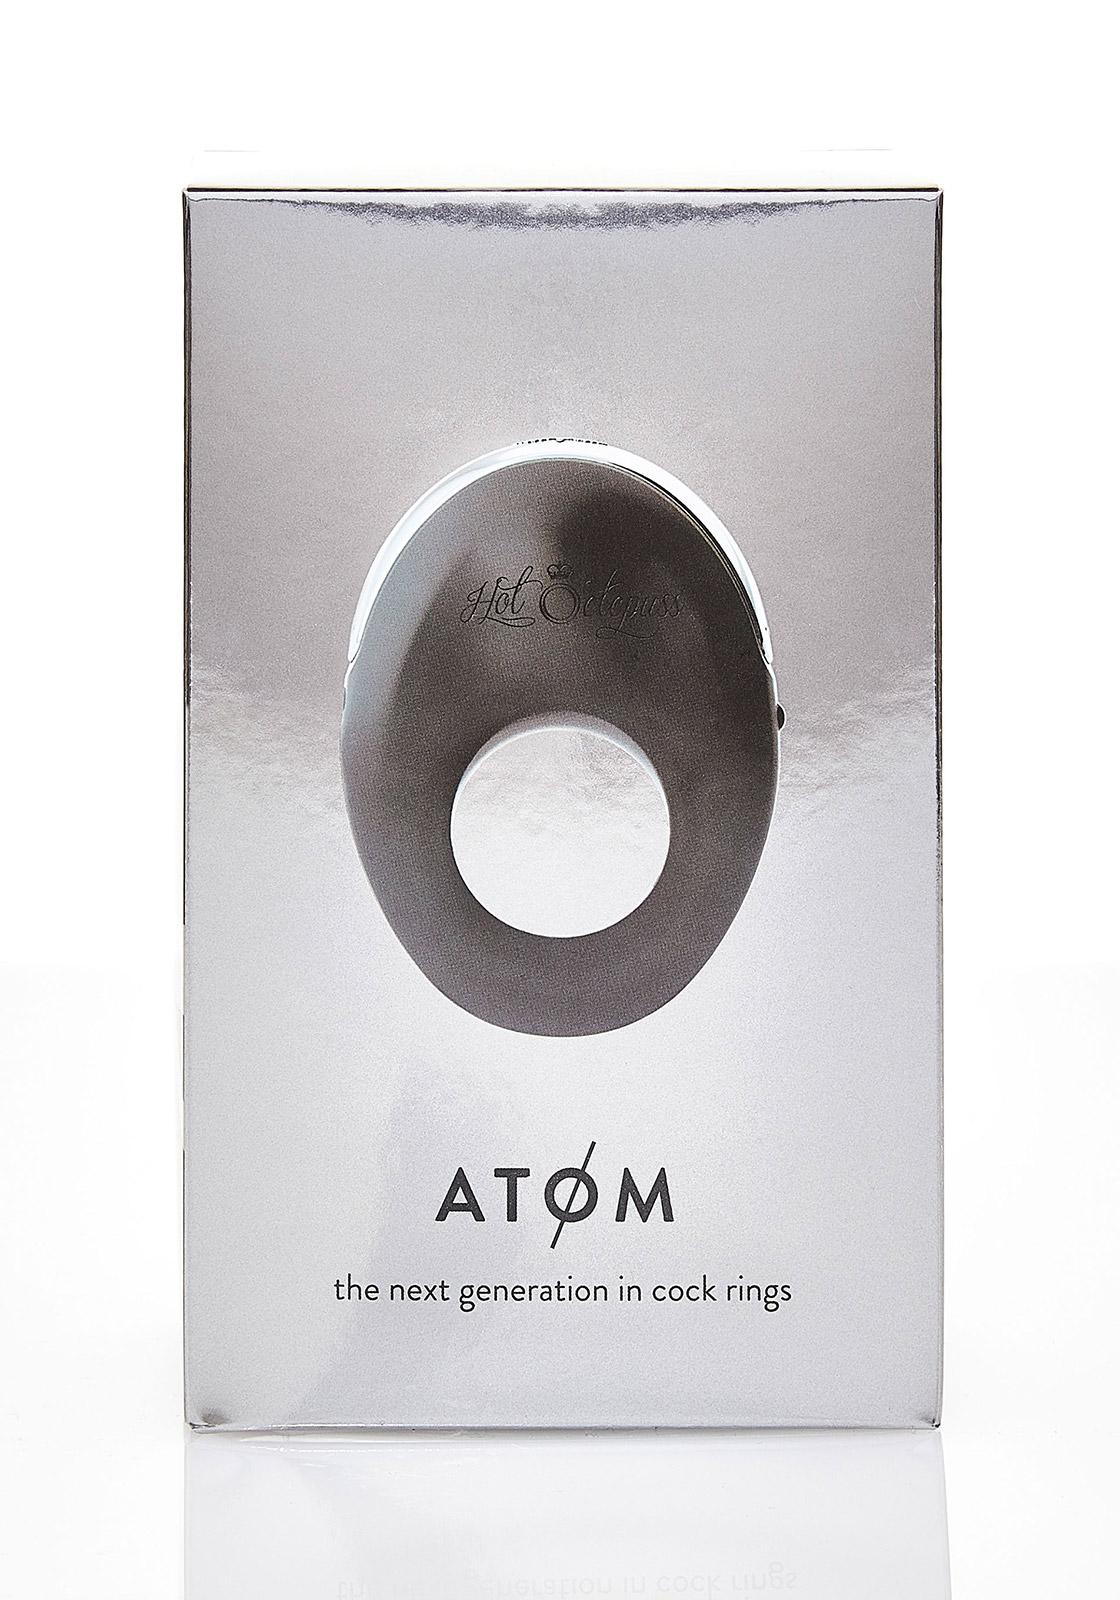 Hot Octopuss: Atom Cockring